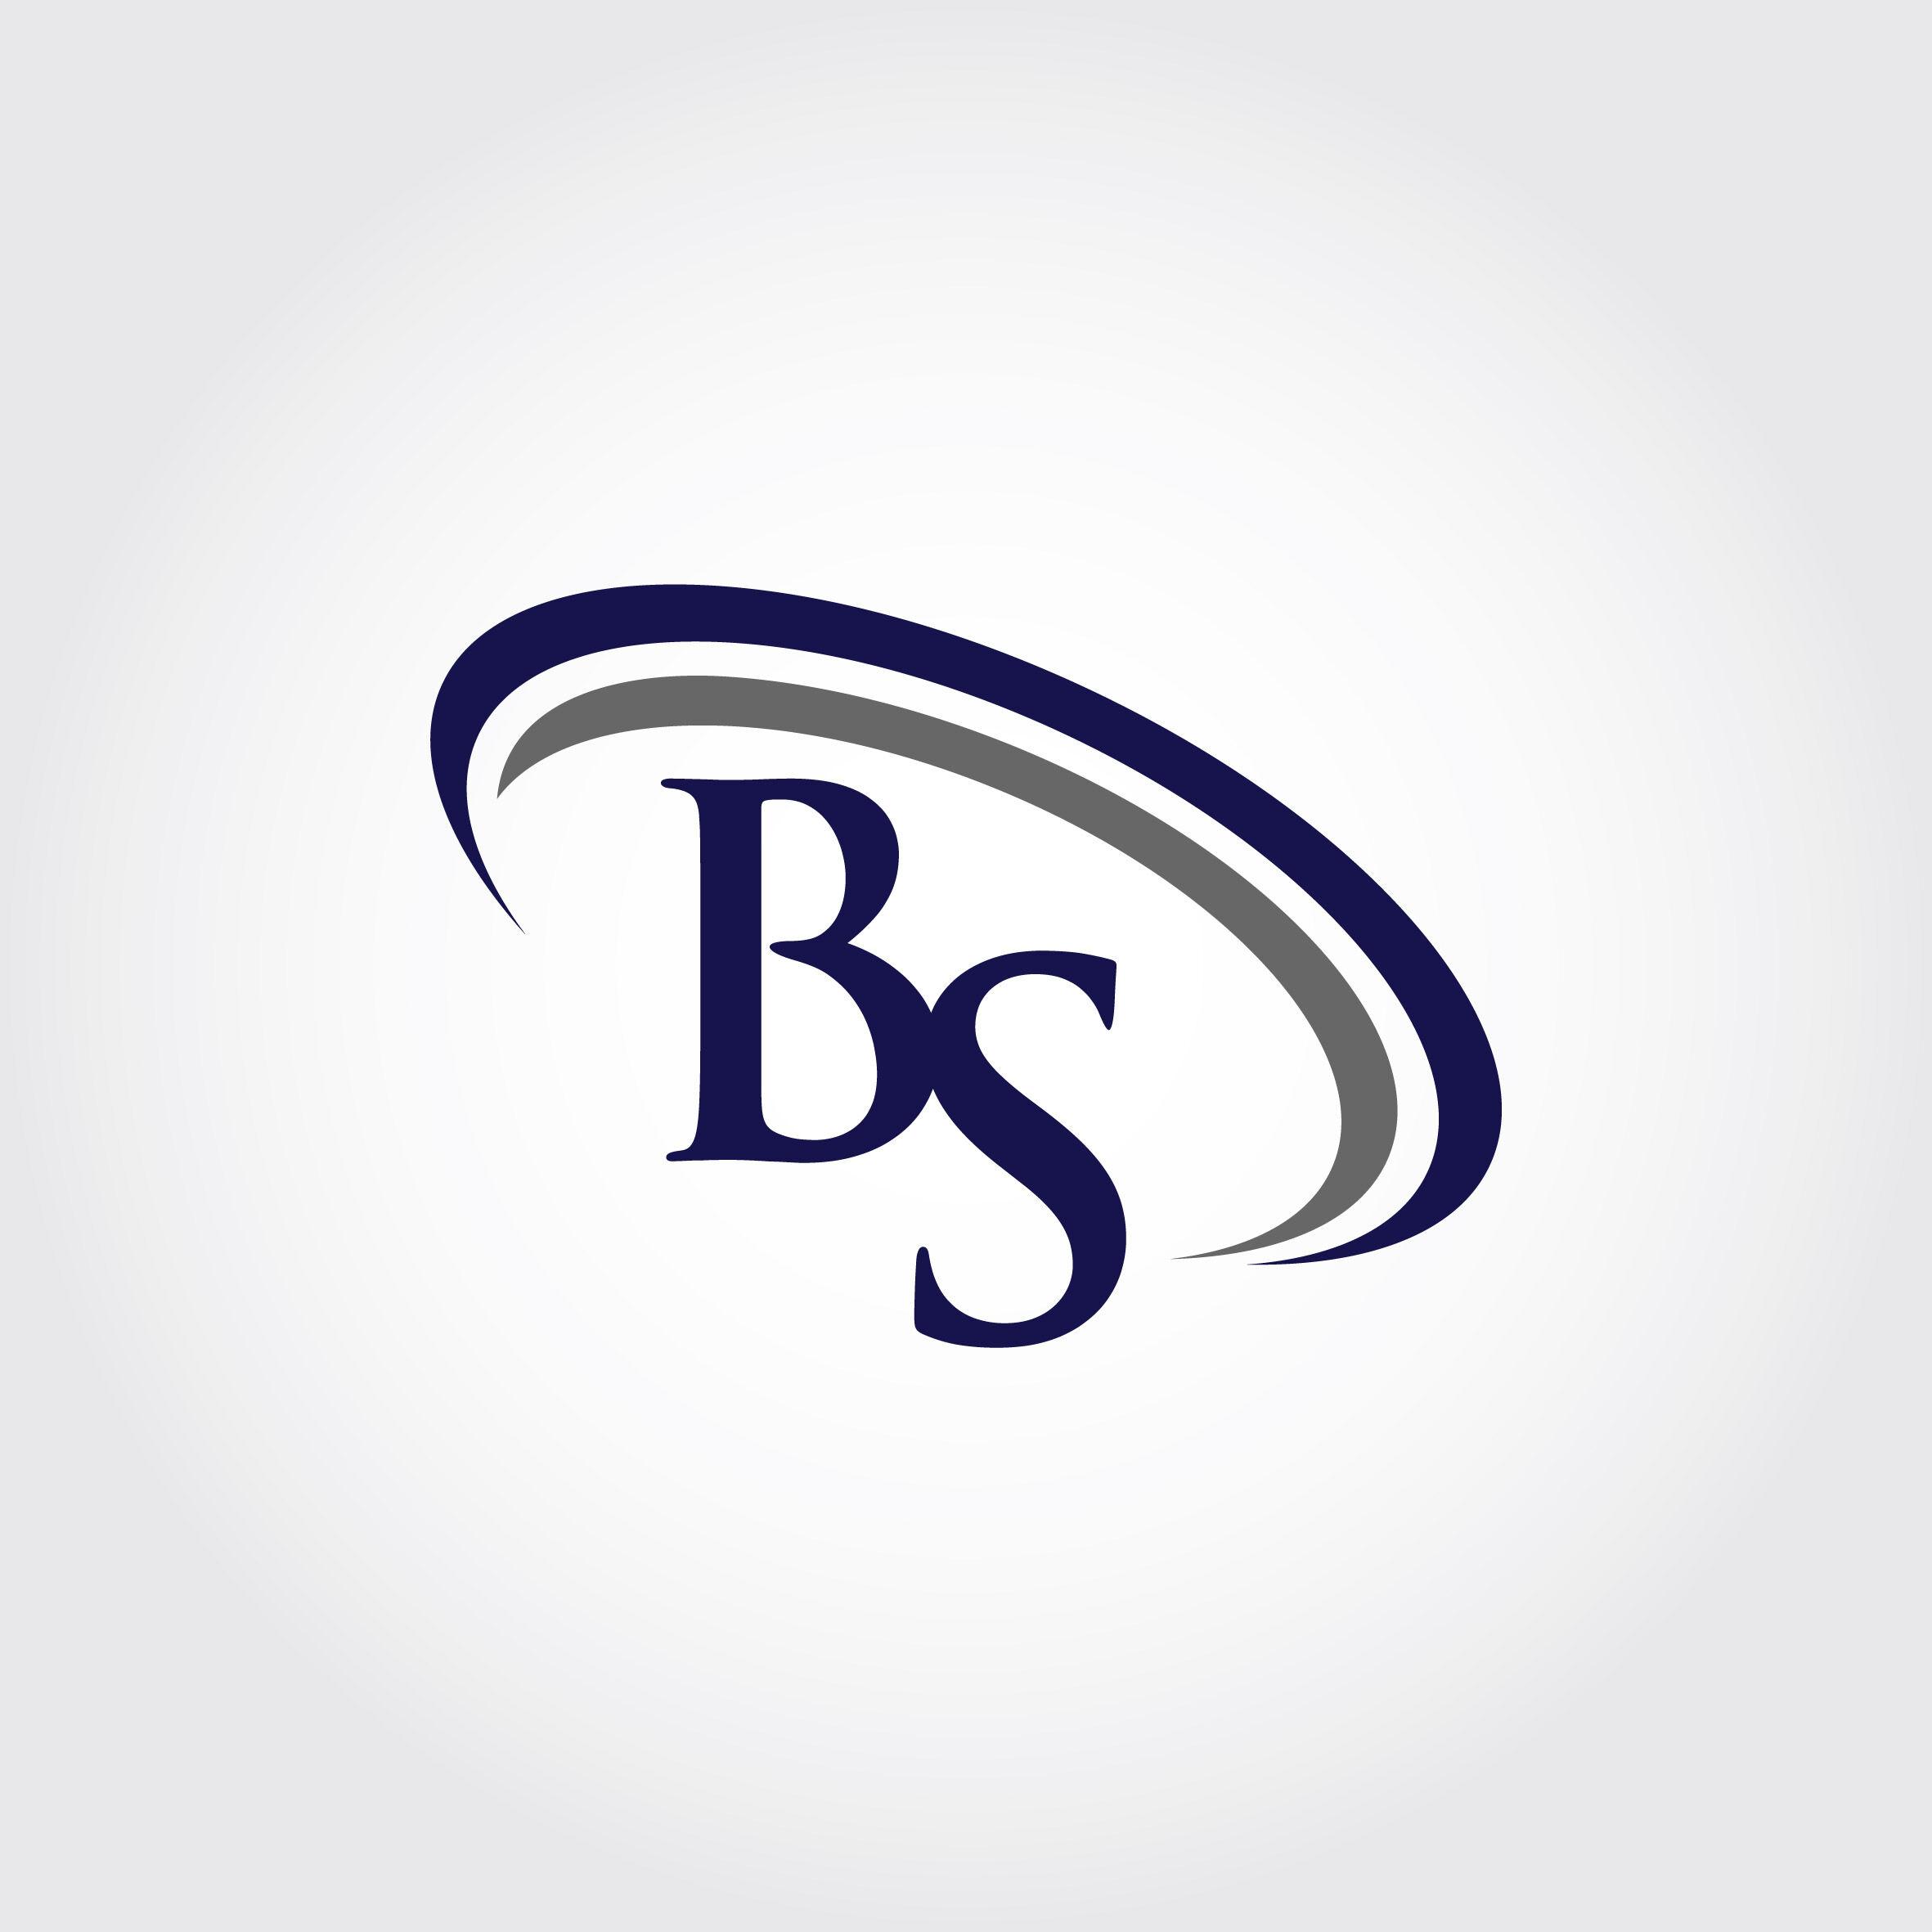 Monogram BS Logo Design By Vectorseller.